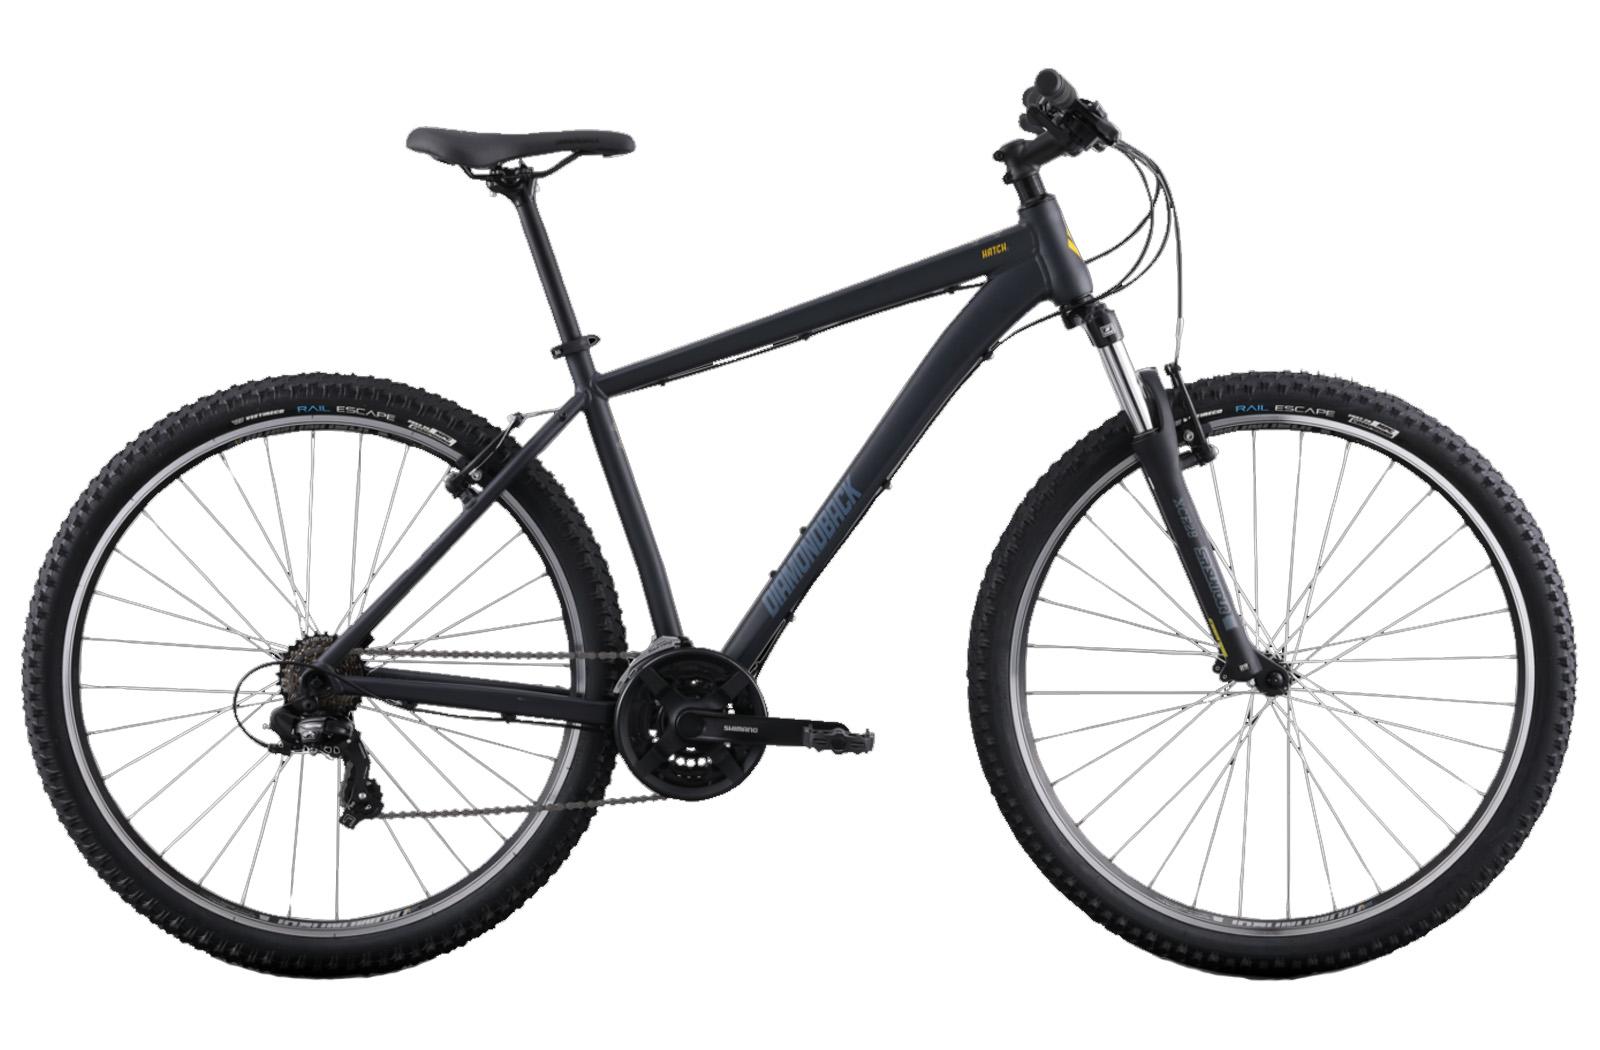 Disponibile ora: Diamondback Hatch 1 Mountain Bike e SILCA HX-One Toolkit